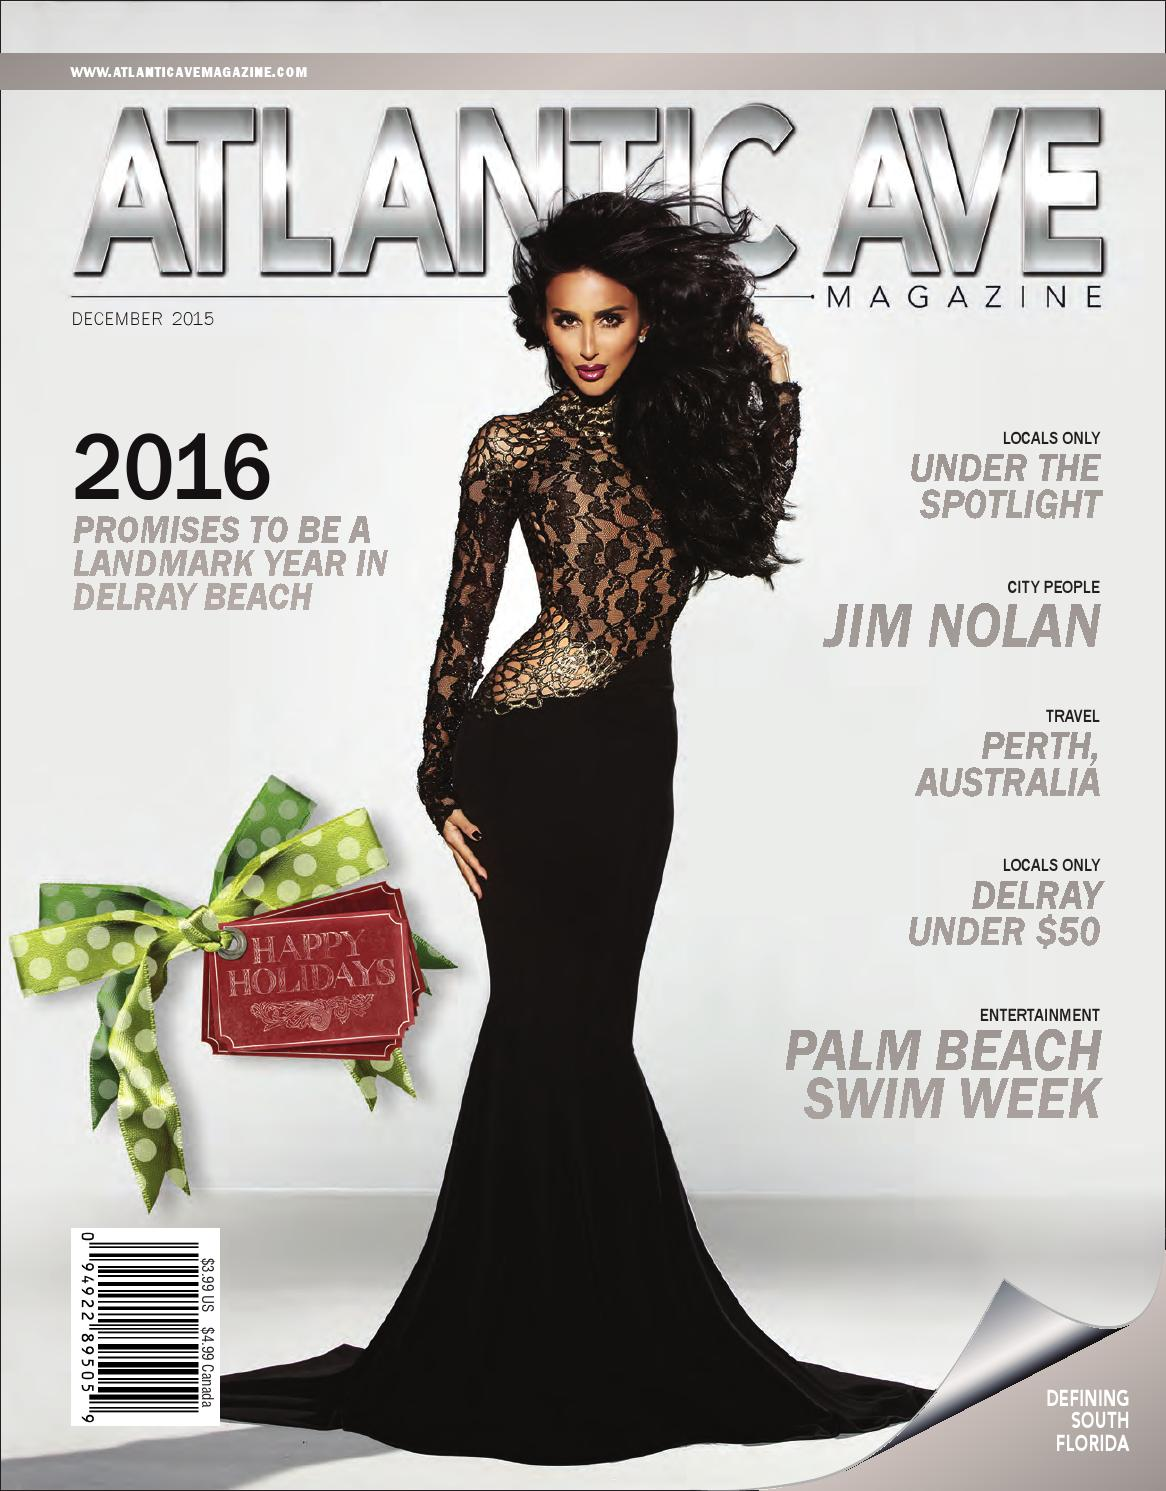 Atlantic Ave Magazine December 2015 by Atlantic Ave Magazine - issuu 8b39b598e